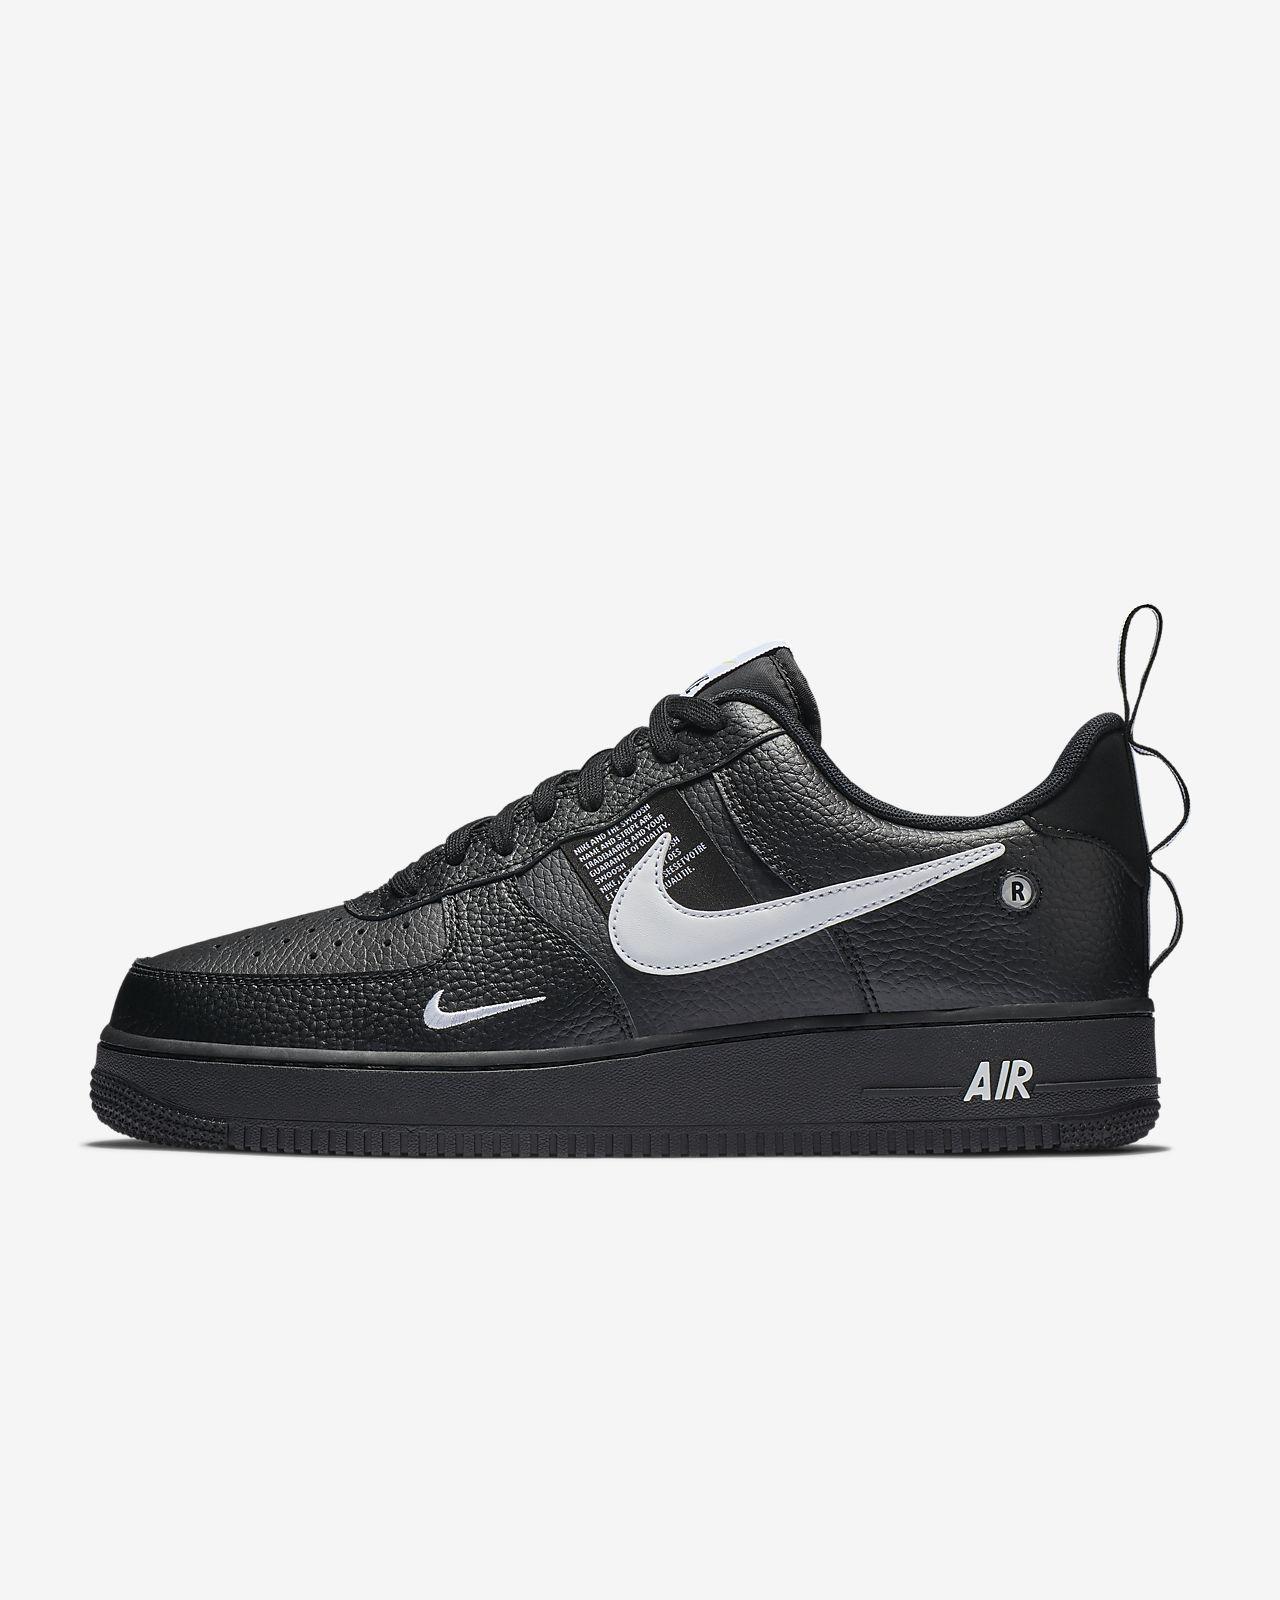 Nike Air Force 1 07 Lv8 Utility Men S Shoe Sneakers Men Fashion Sneakers Fashion Shoes Mens